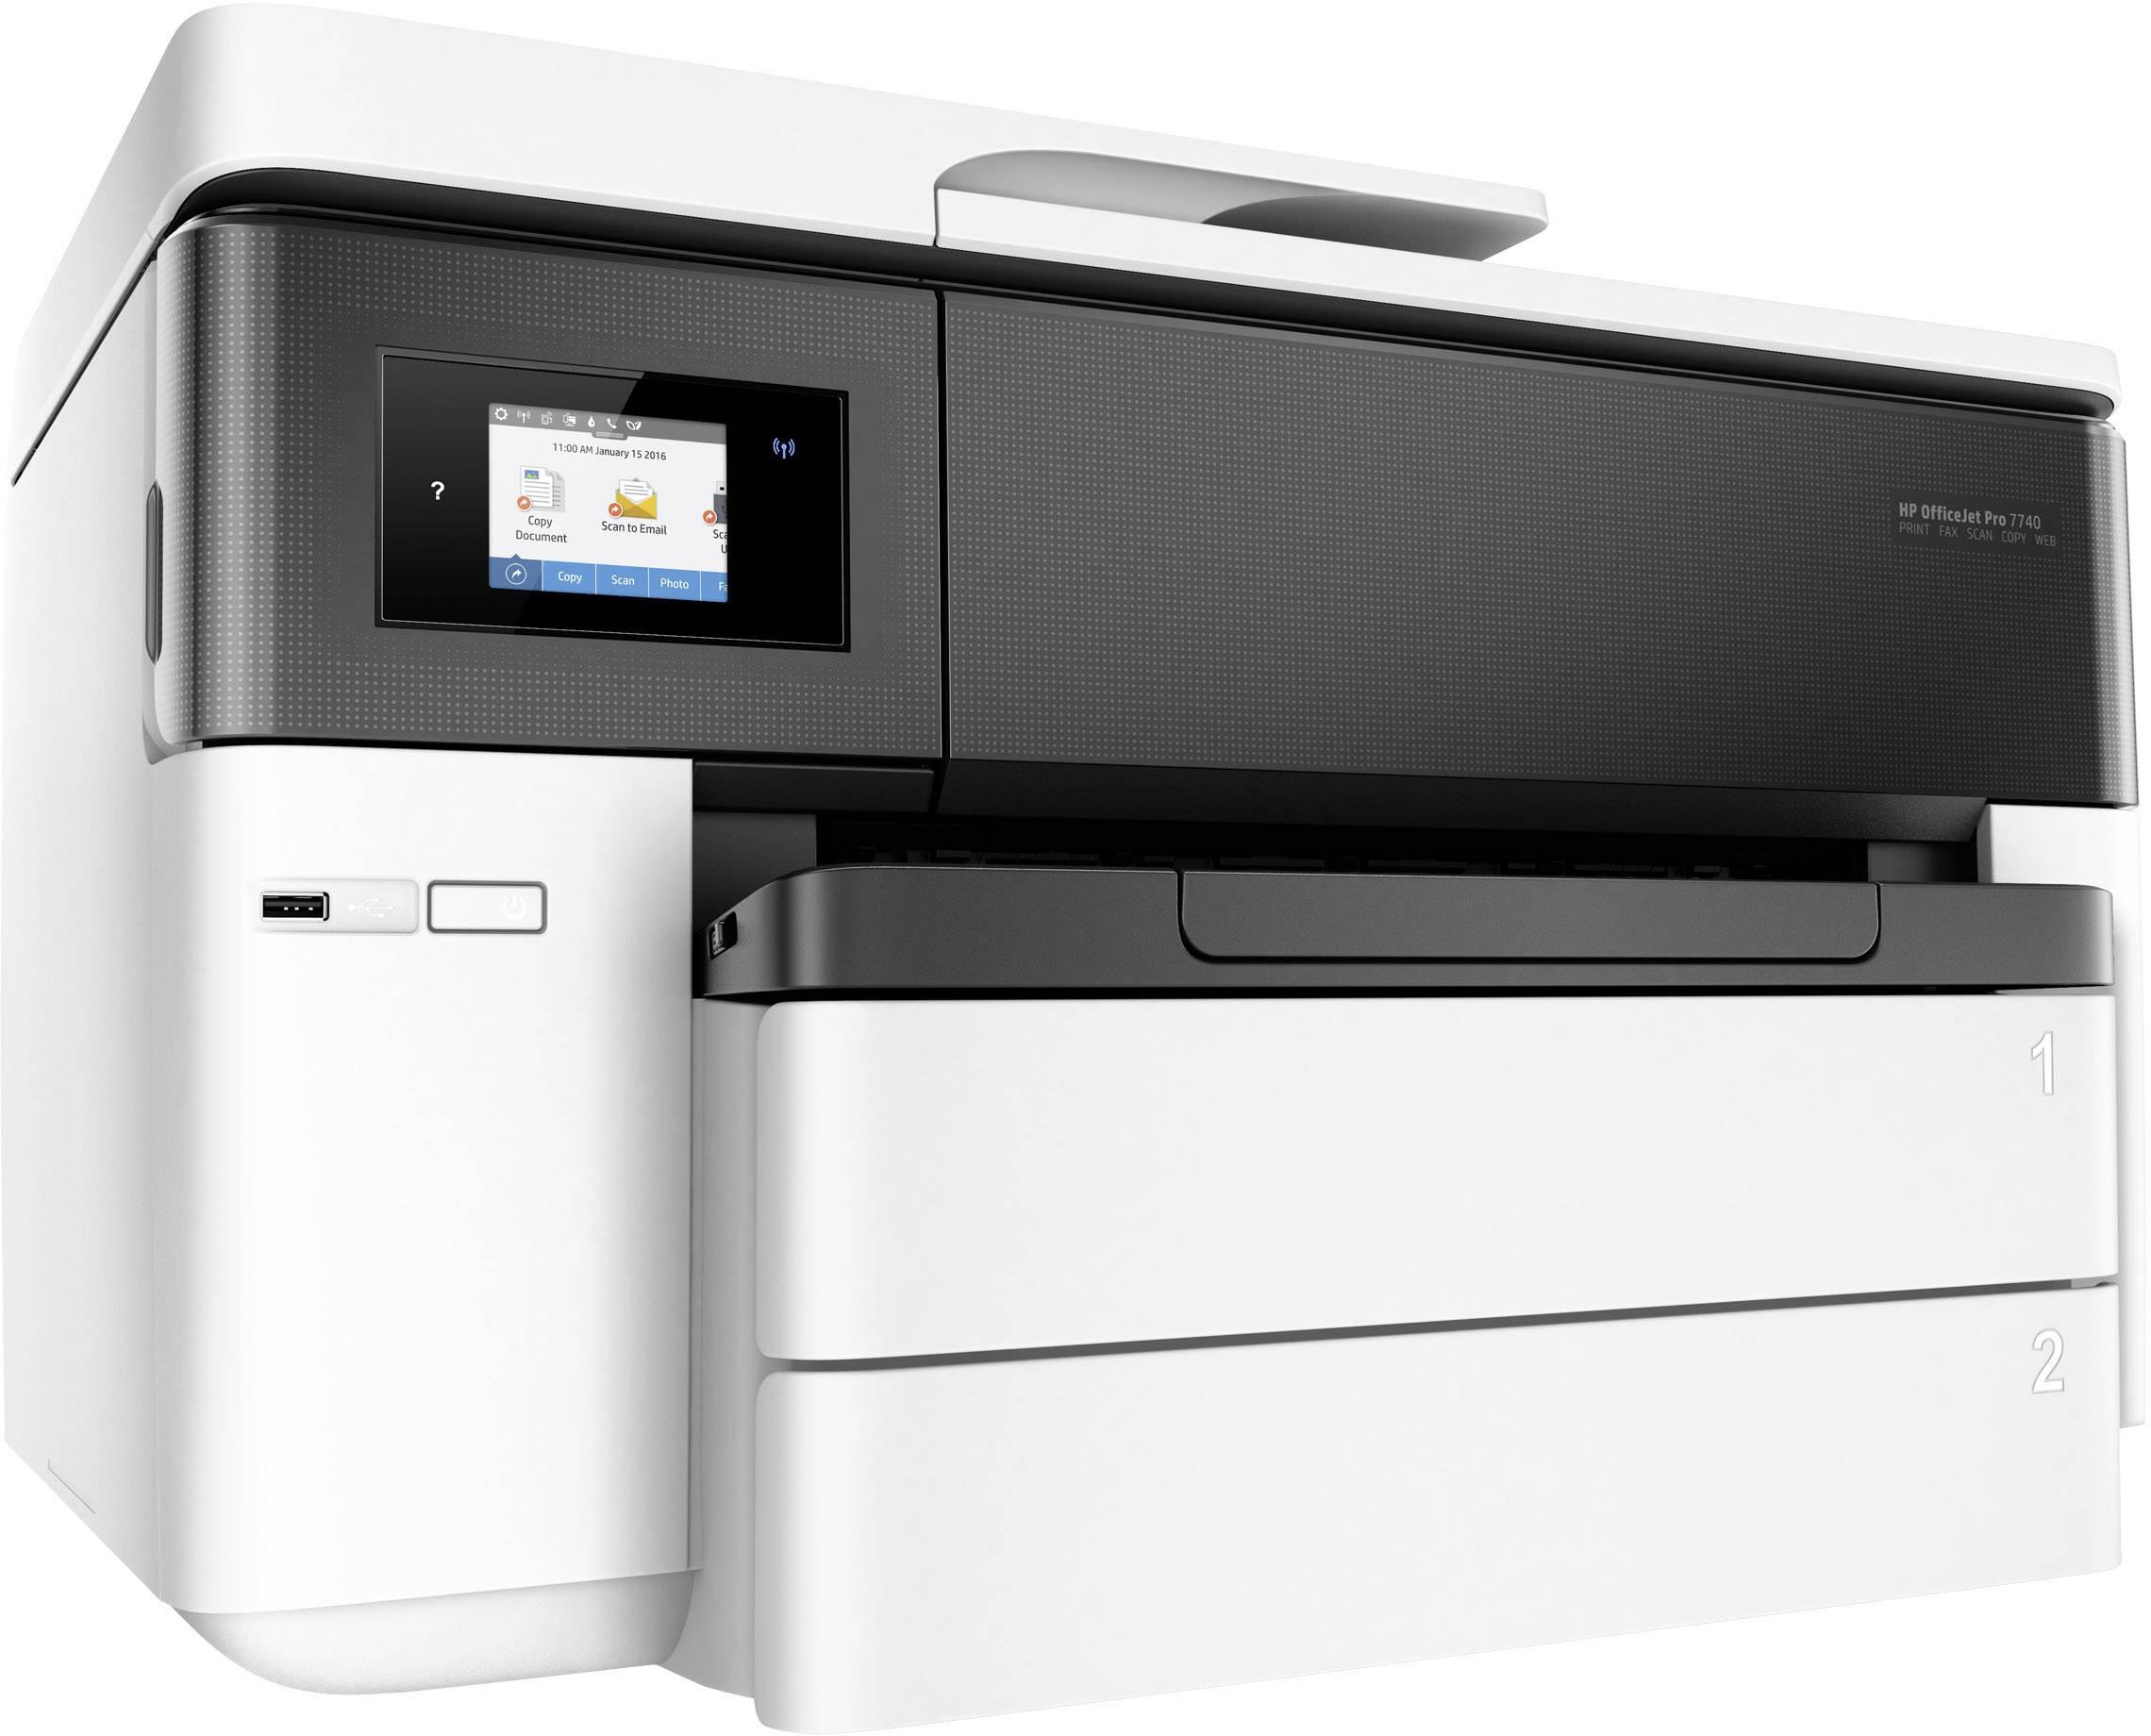 HP OfficeJet Pro 7740 Wide Format All in One Imprimante multifonction à jet d'encre couleur A3 imprimante, scanner, phot